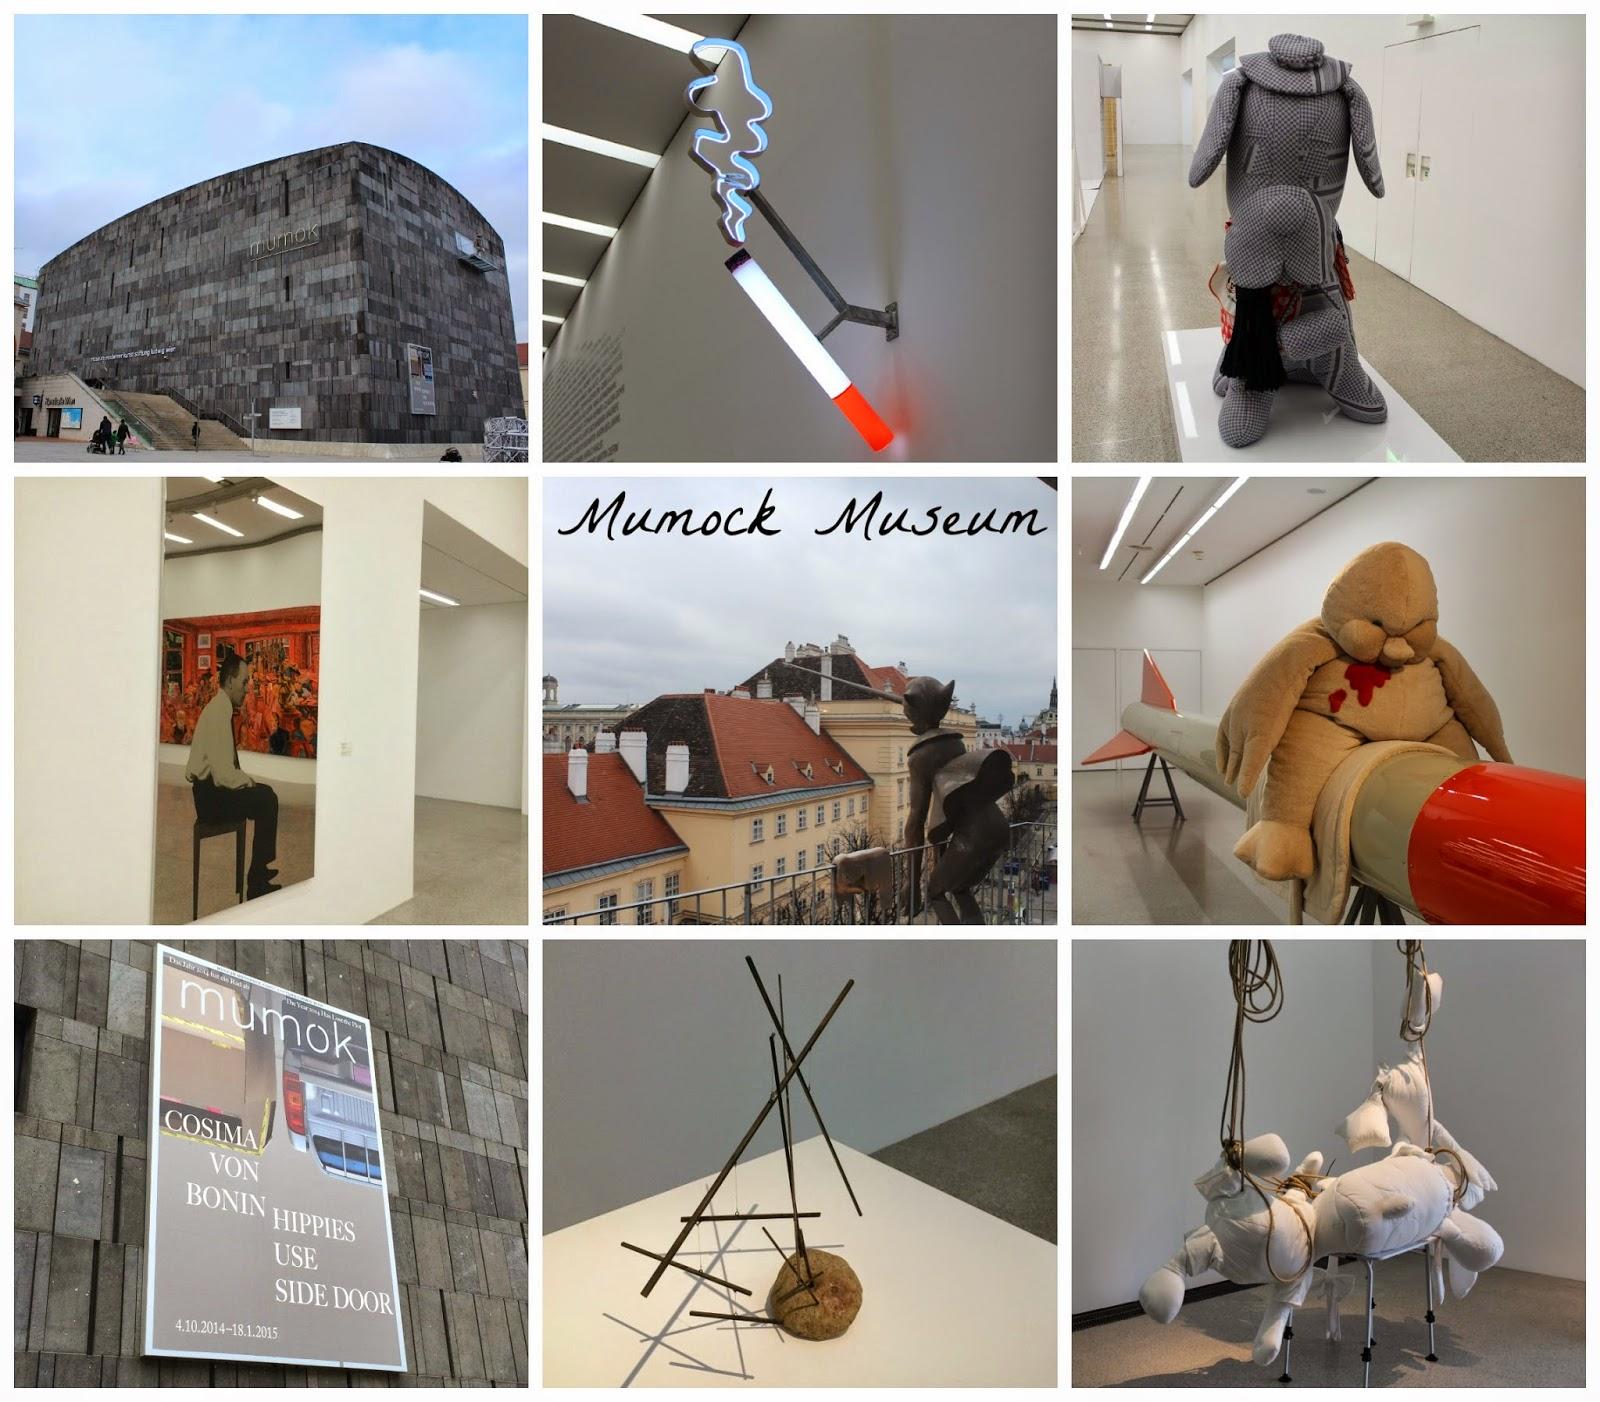 Mumock Museum